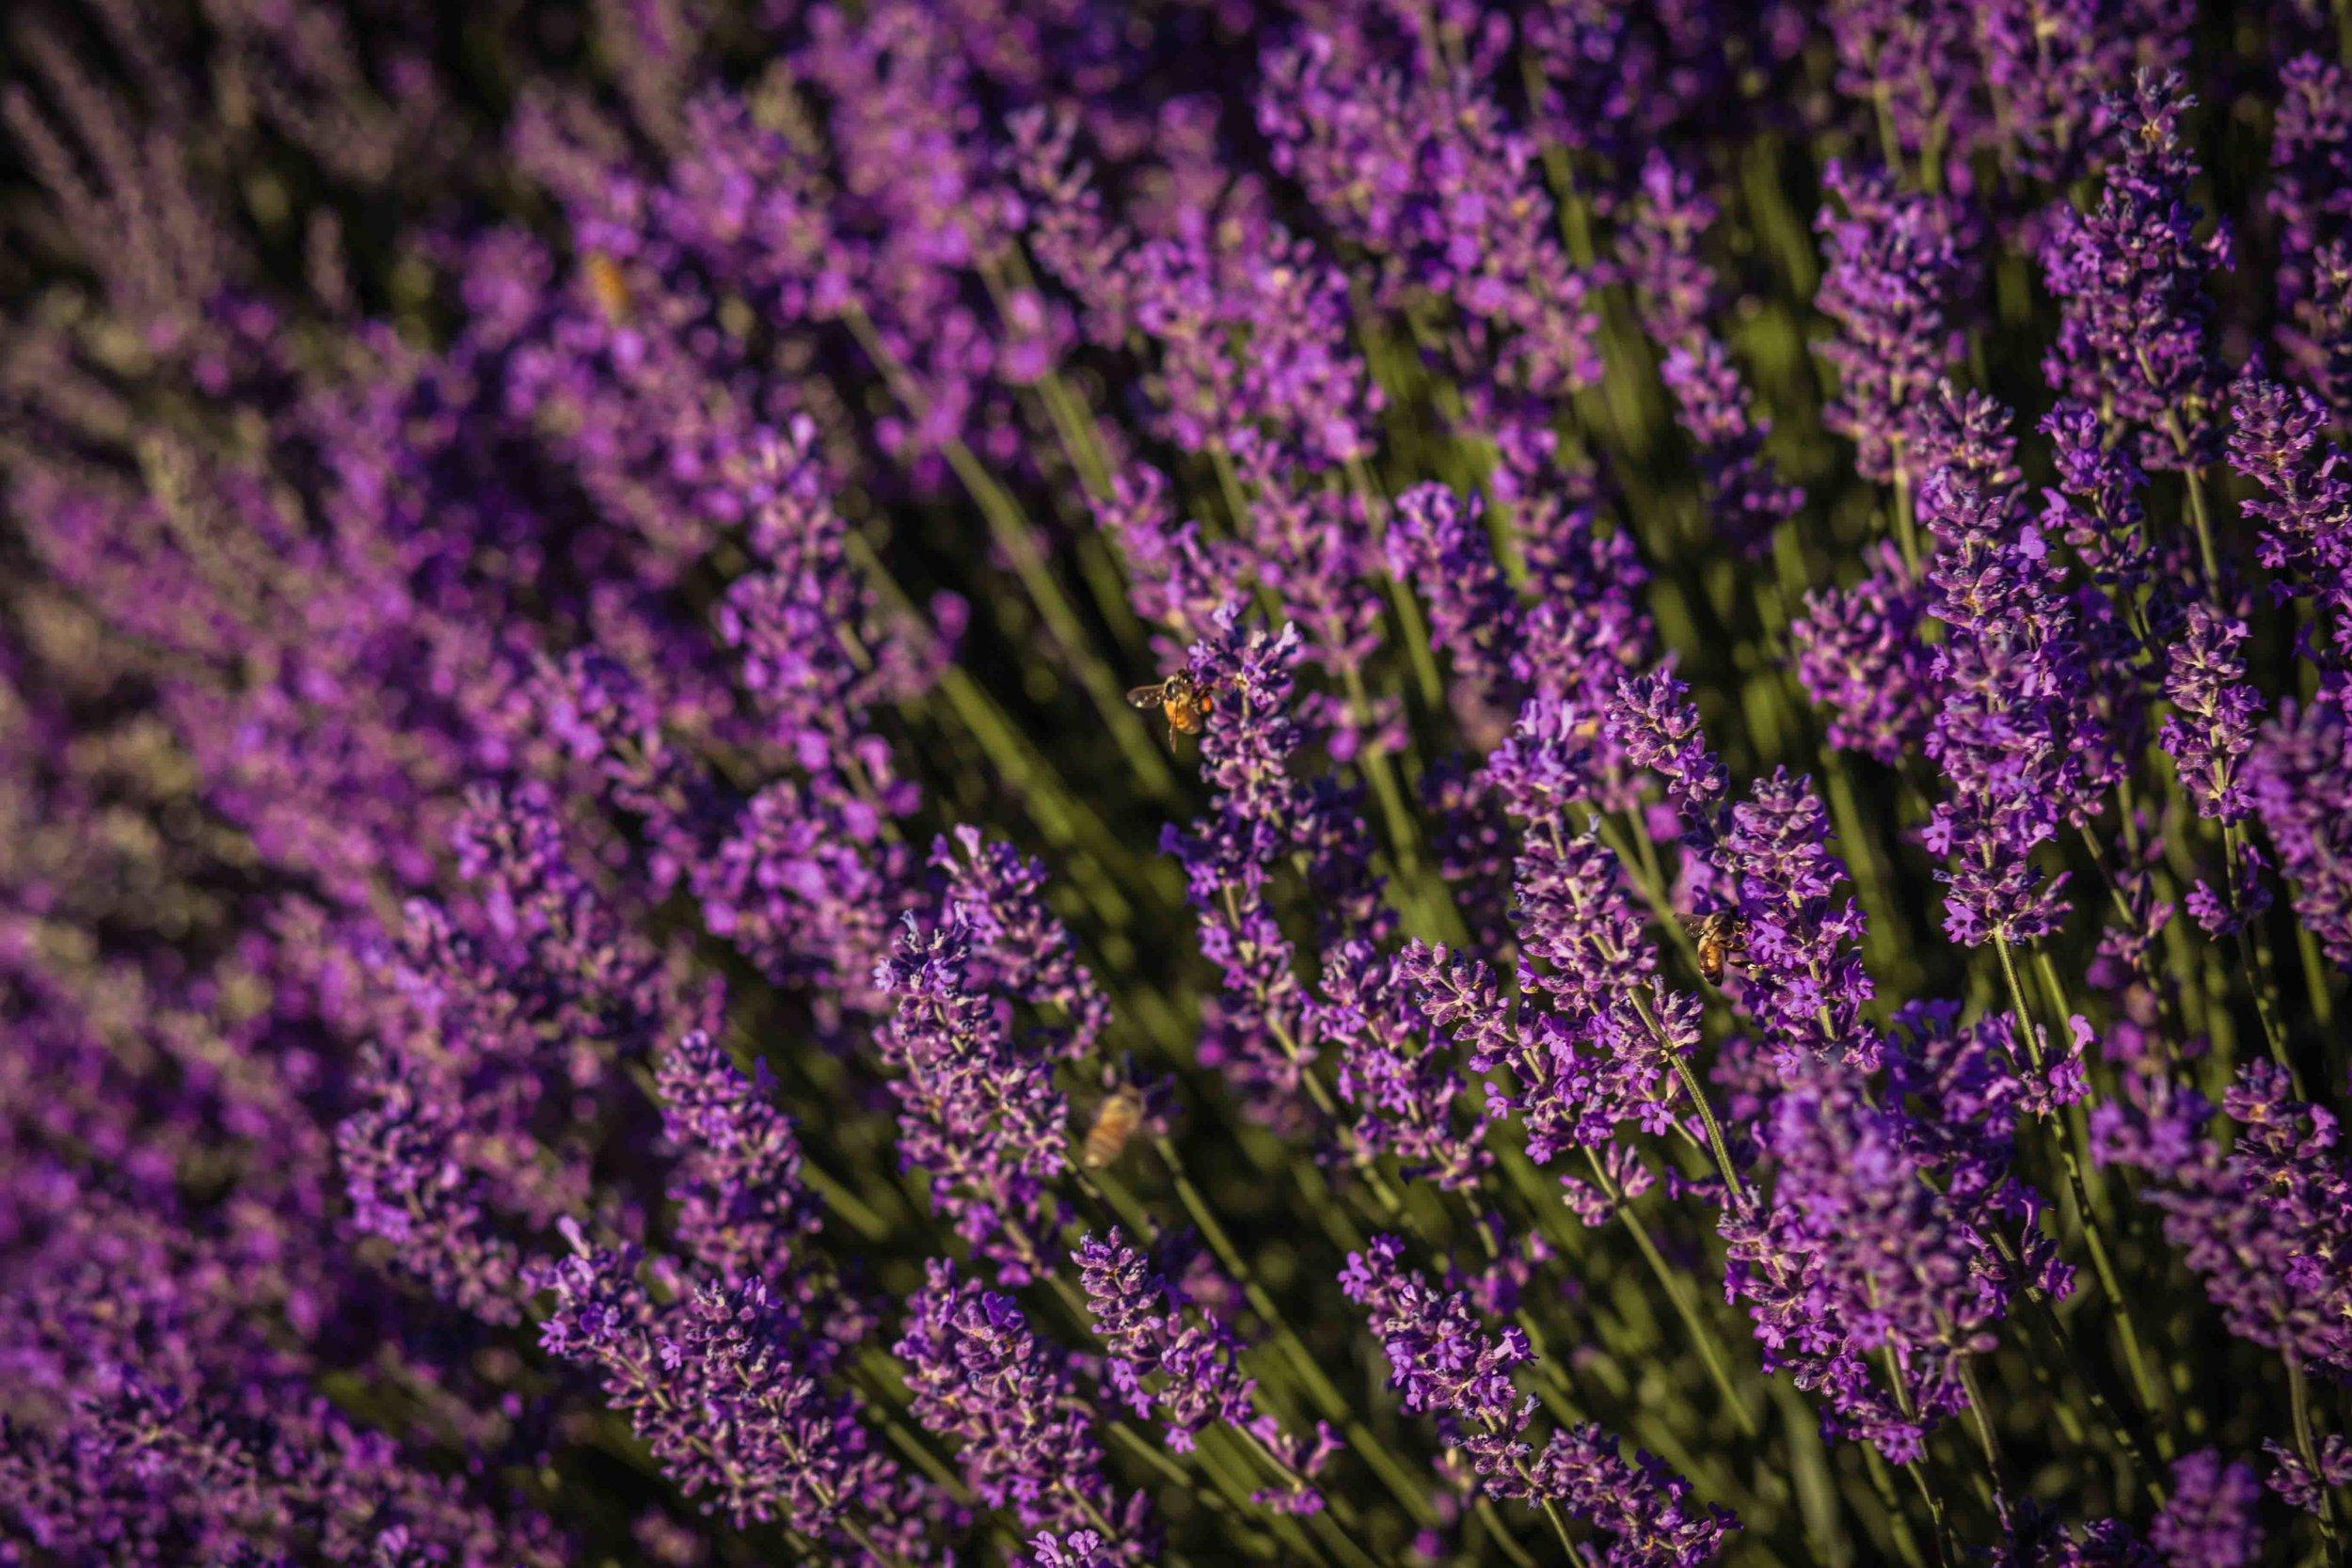 Hood River Lavender Farms Columbia Gorge buy lavender online hood river odell portland pacific northwest pnw creams lavender_-35.jpg